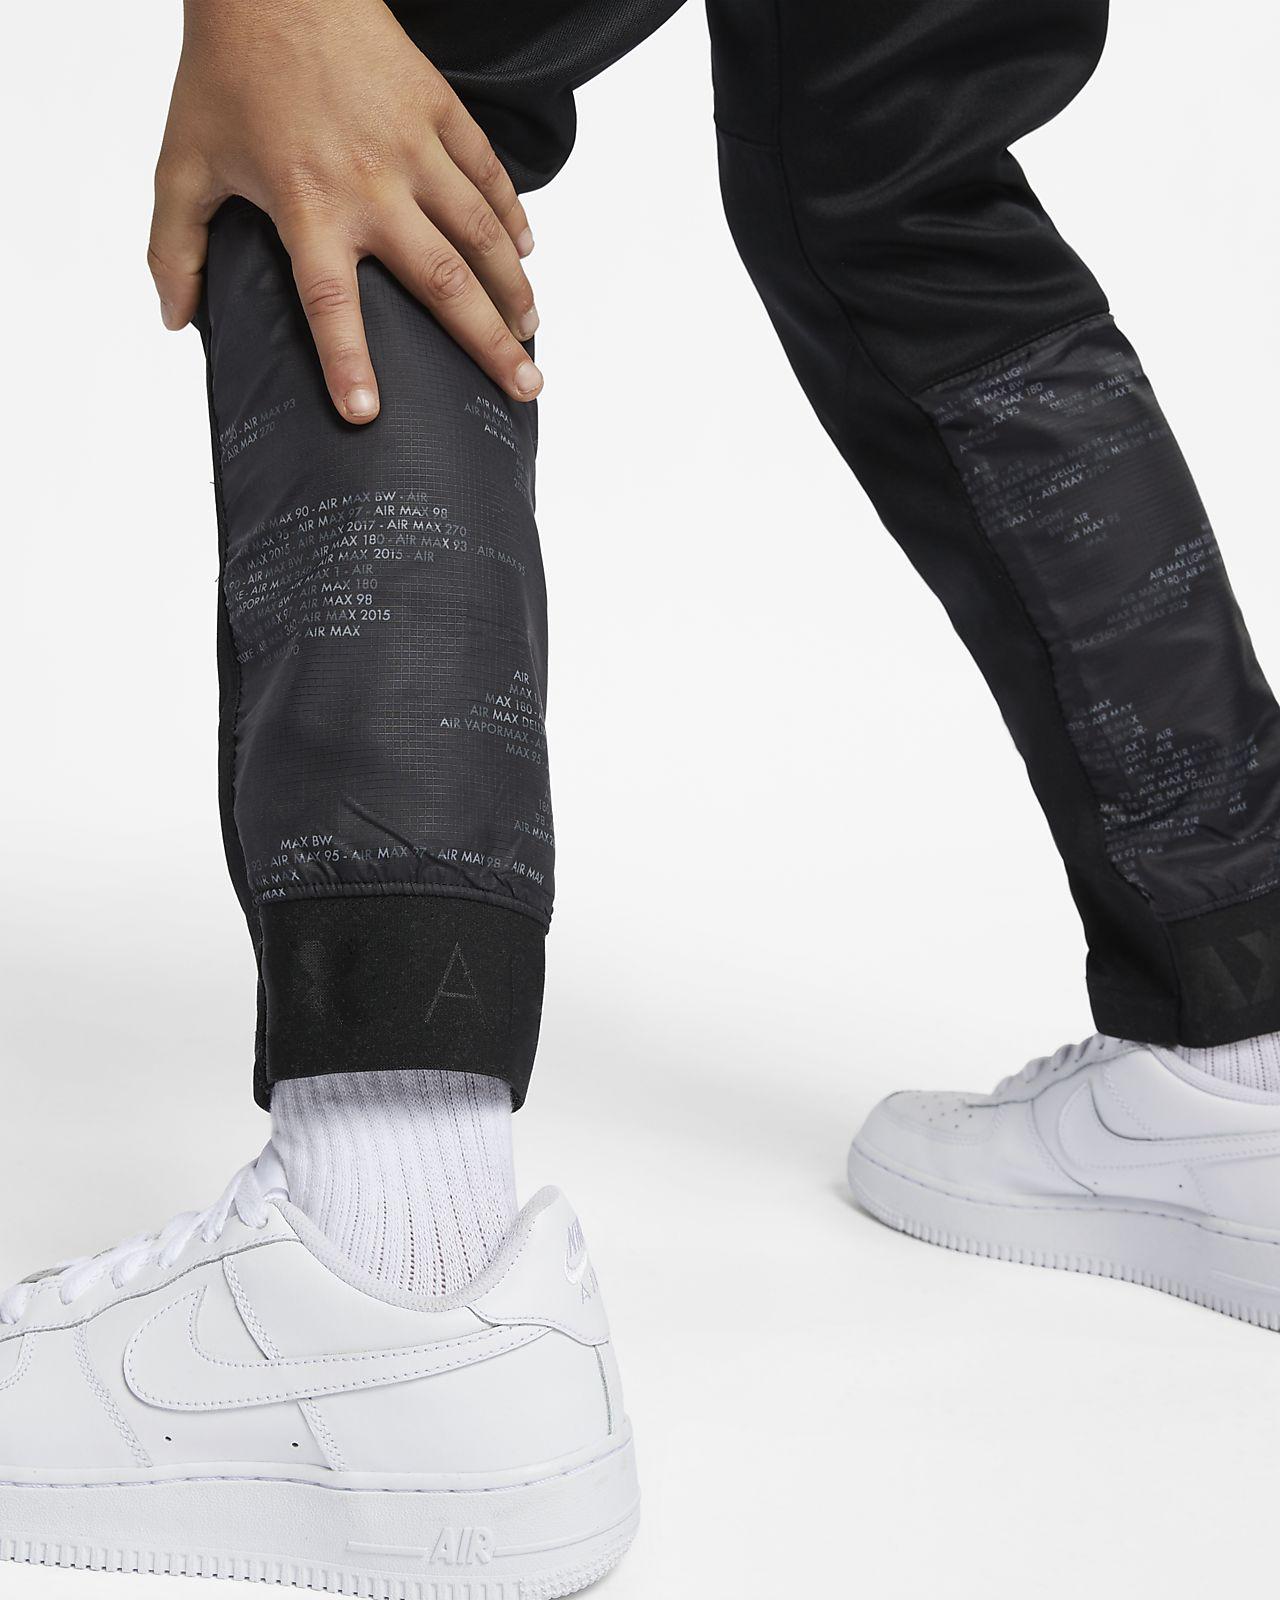 KinderJungen für Sportswear ältere Nike Jogger 9IEDH2